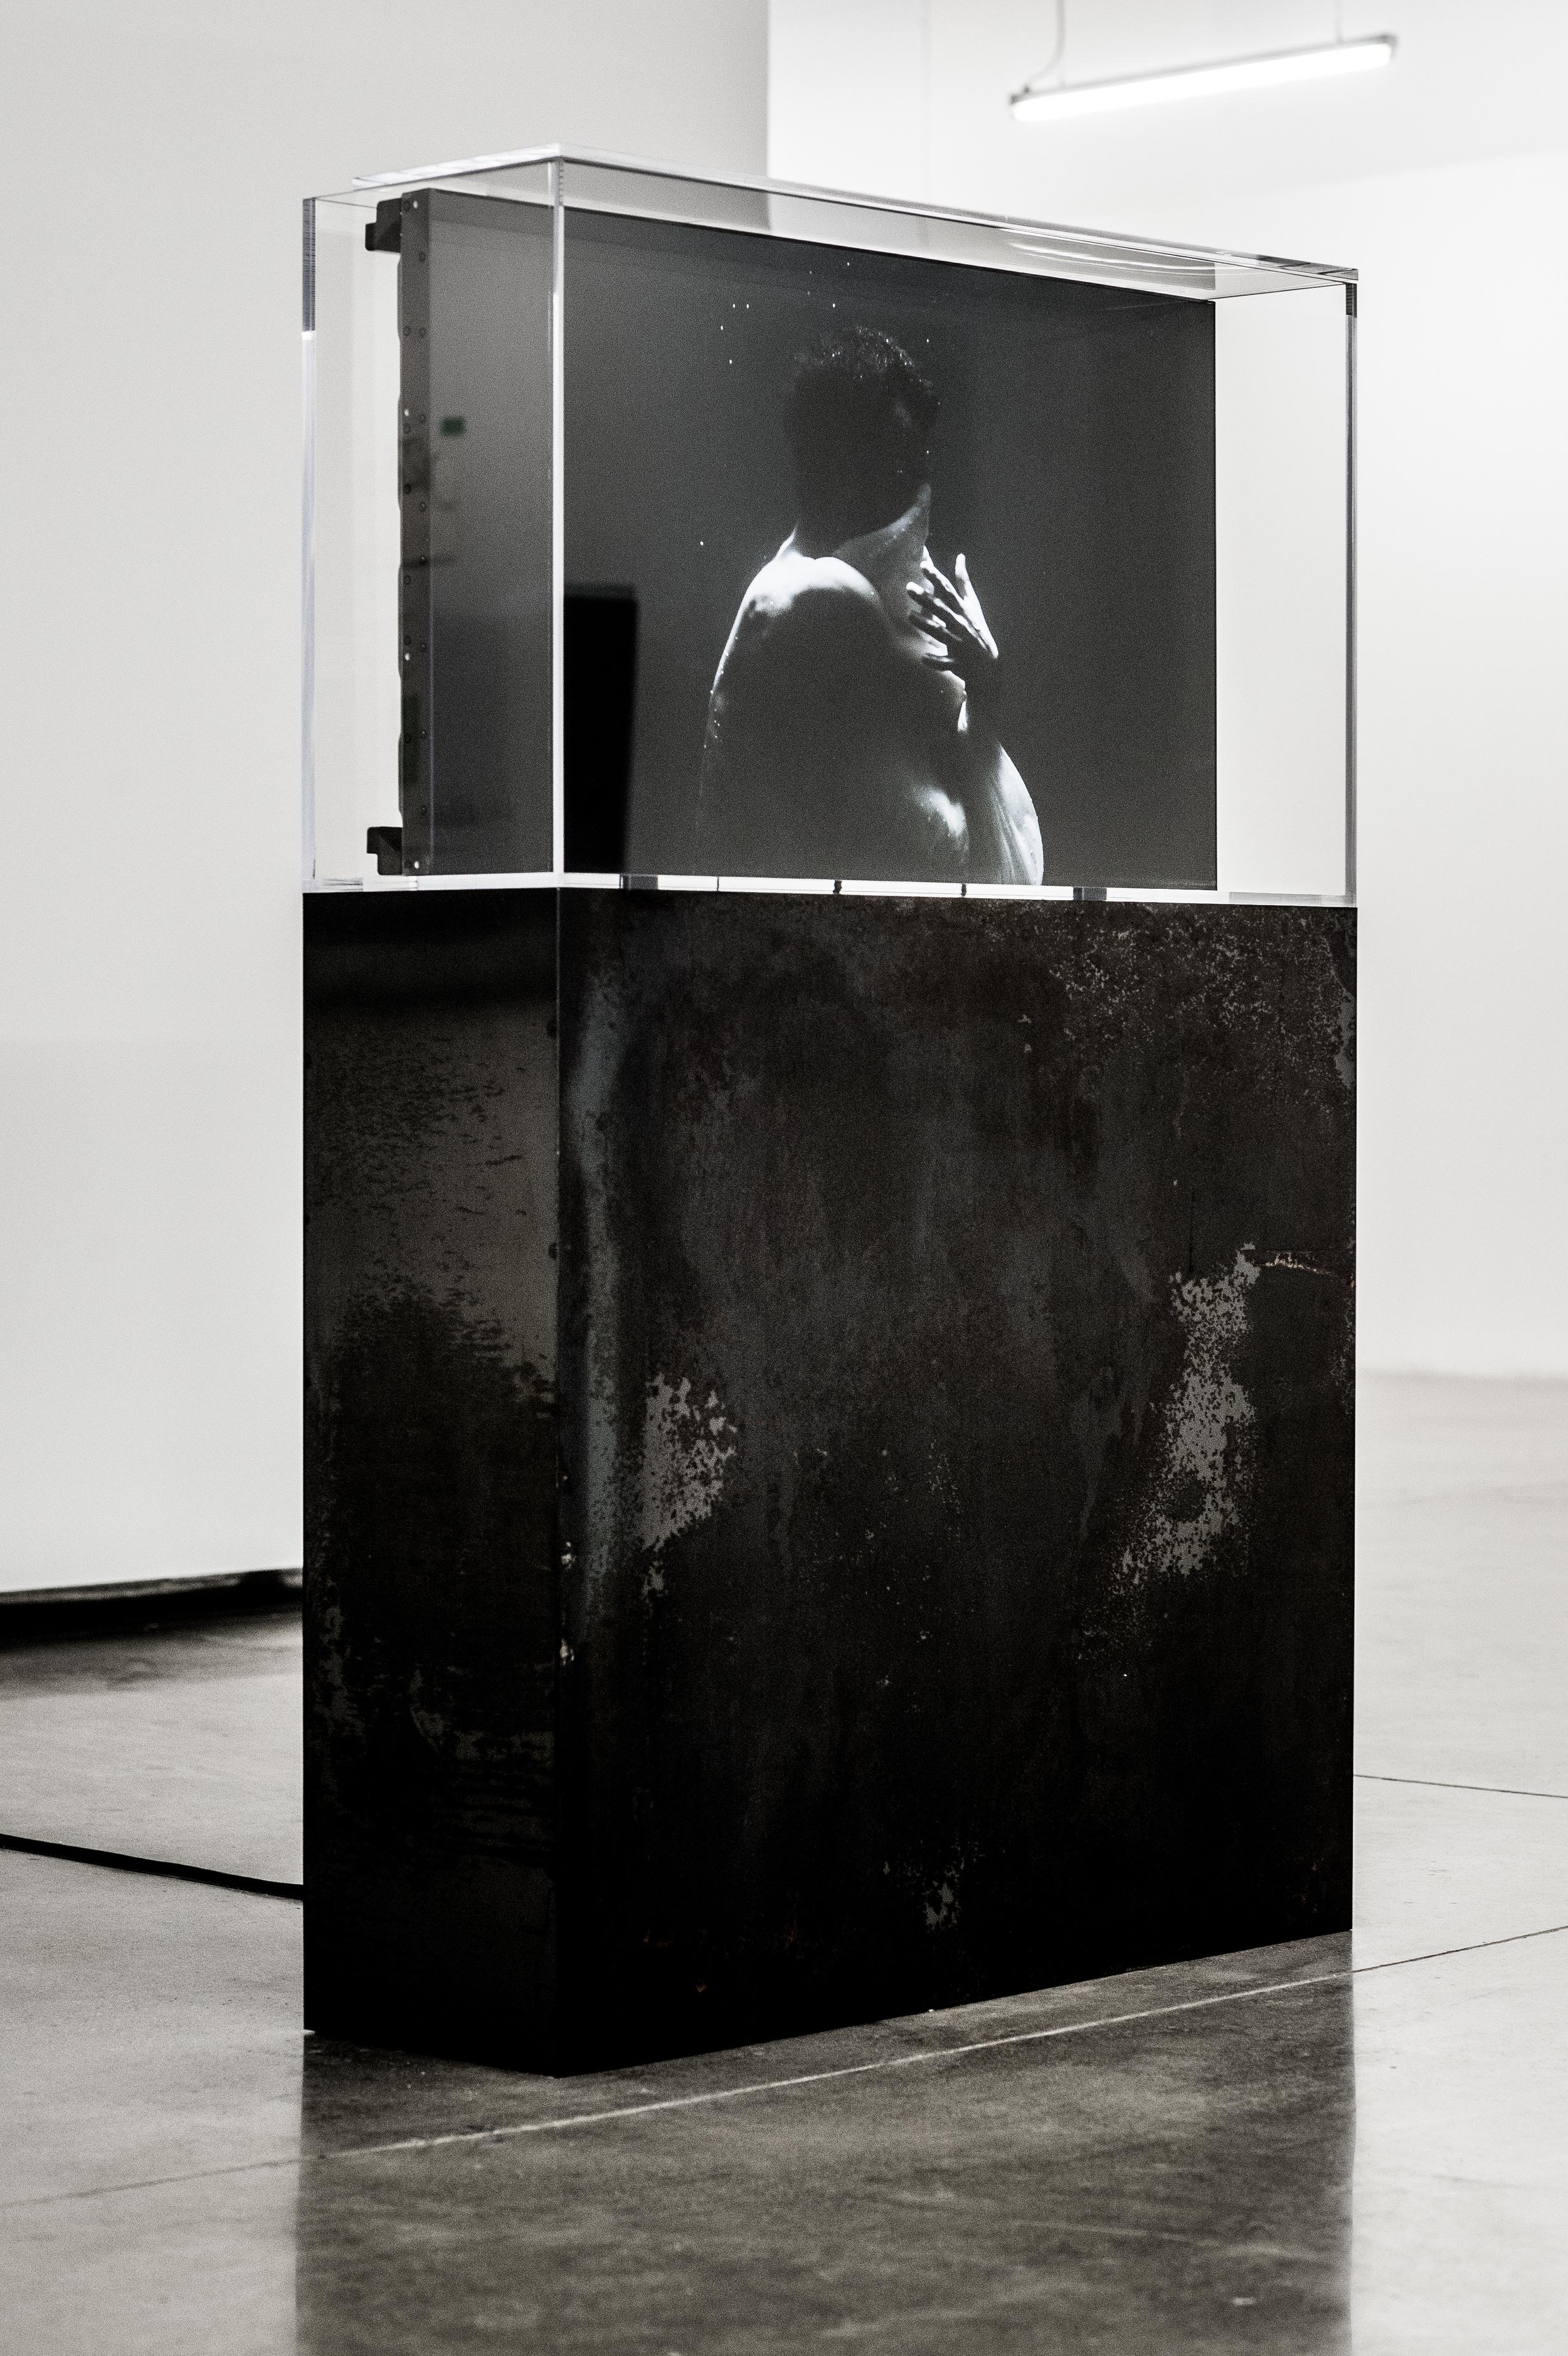 "y2o Huis clos,  2015.   Installation vidéo avec acier, acrylique, ordinateur et moniteur Video installation with steel, acrylic, computer and screen   162.5 x 106.7 x 32.4 cm (64"" x 42 ½"" x 12 ¾"")   2h 53 min 18 sec.   Edition 1/2   Collection Majudia"